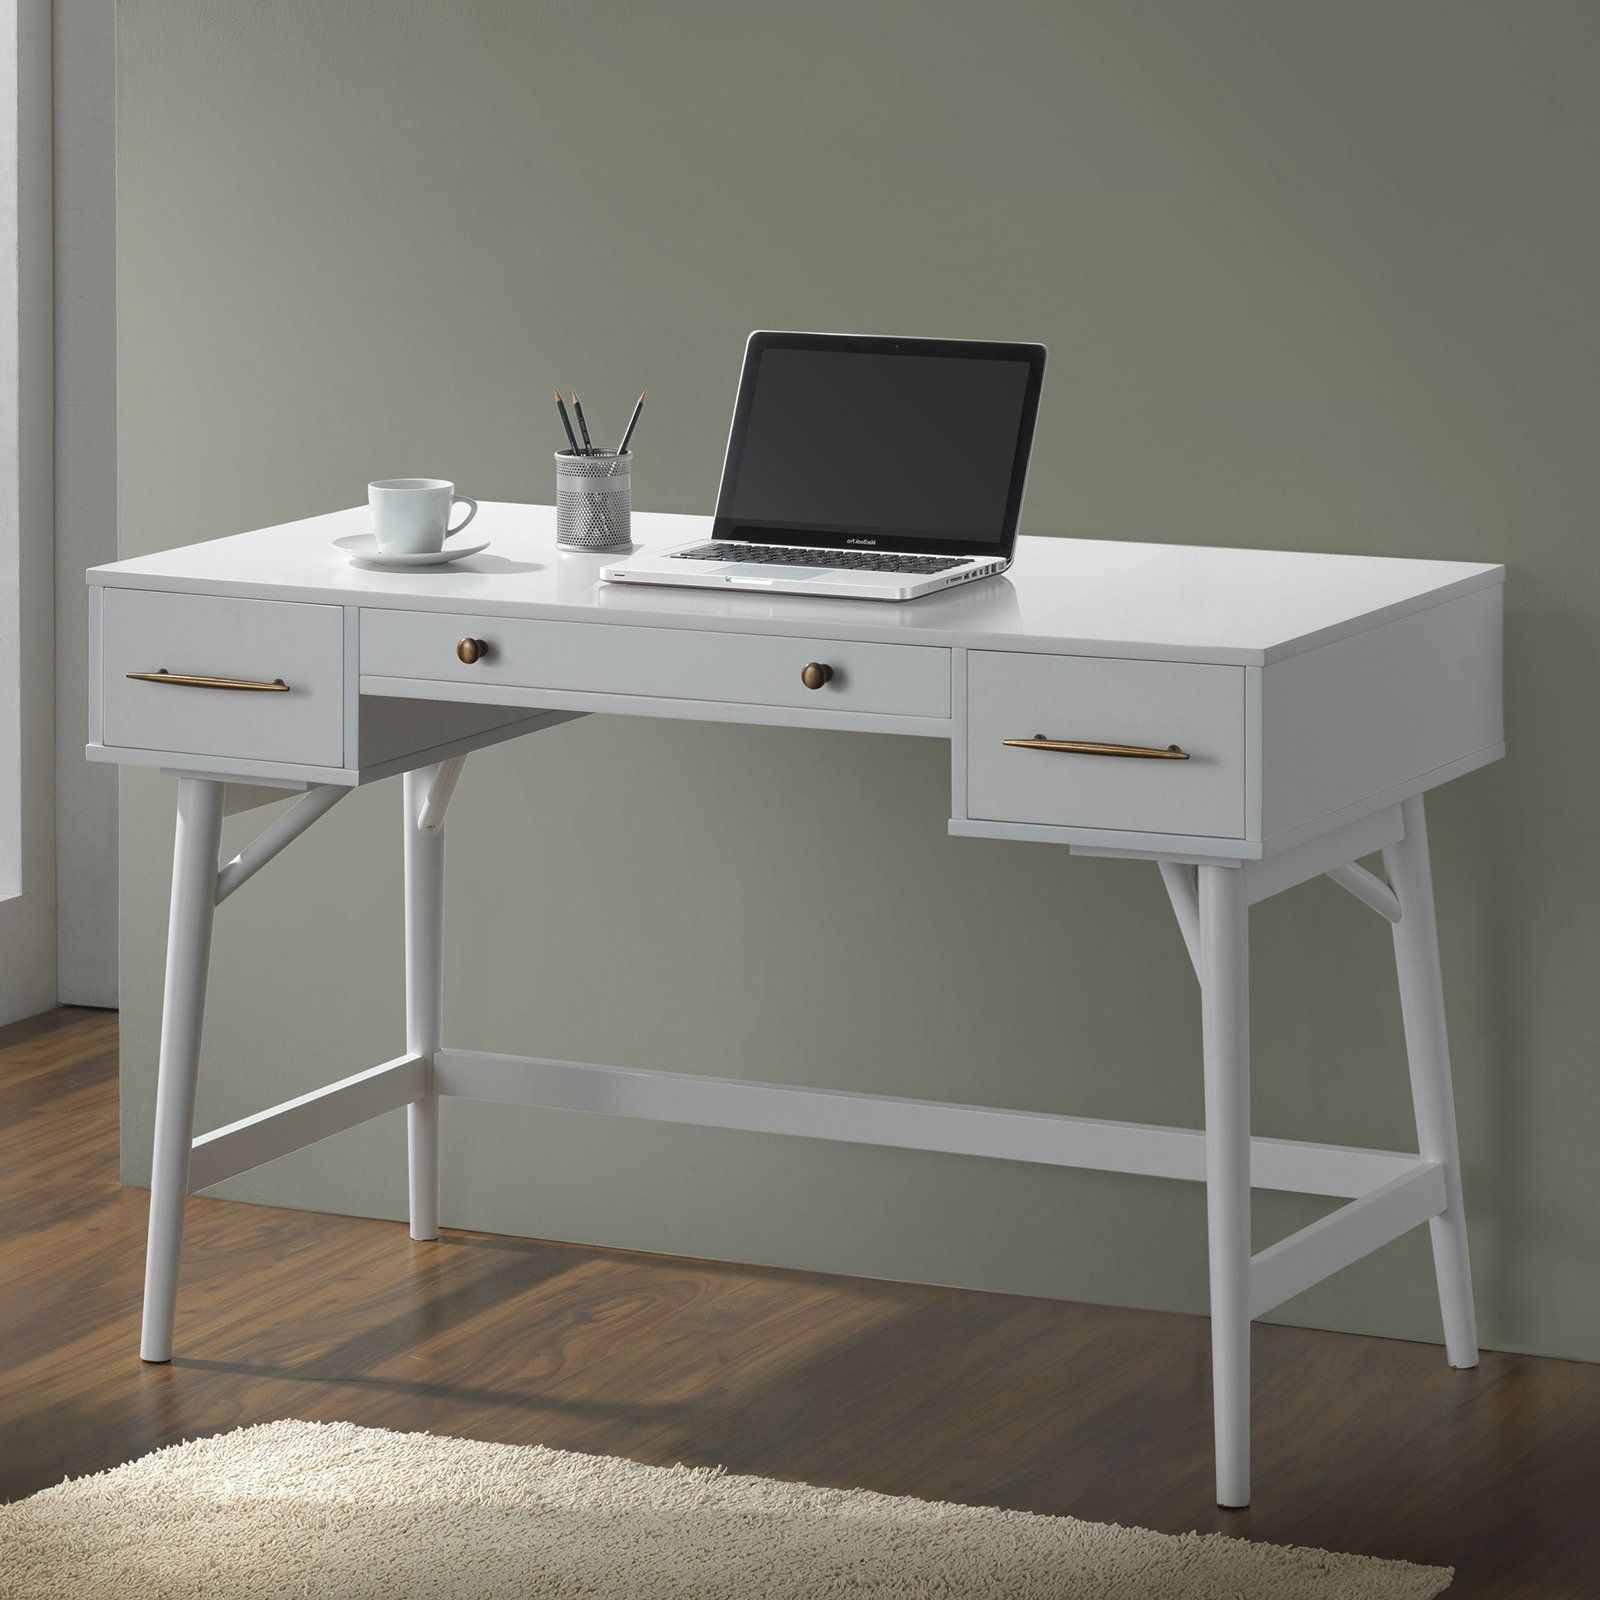 Coaster Furniture Walnut Writing Desk White Writing Desk Modern